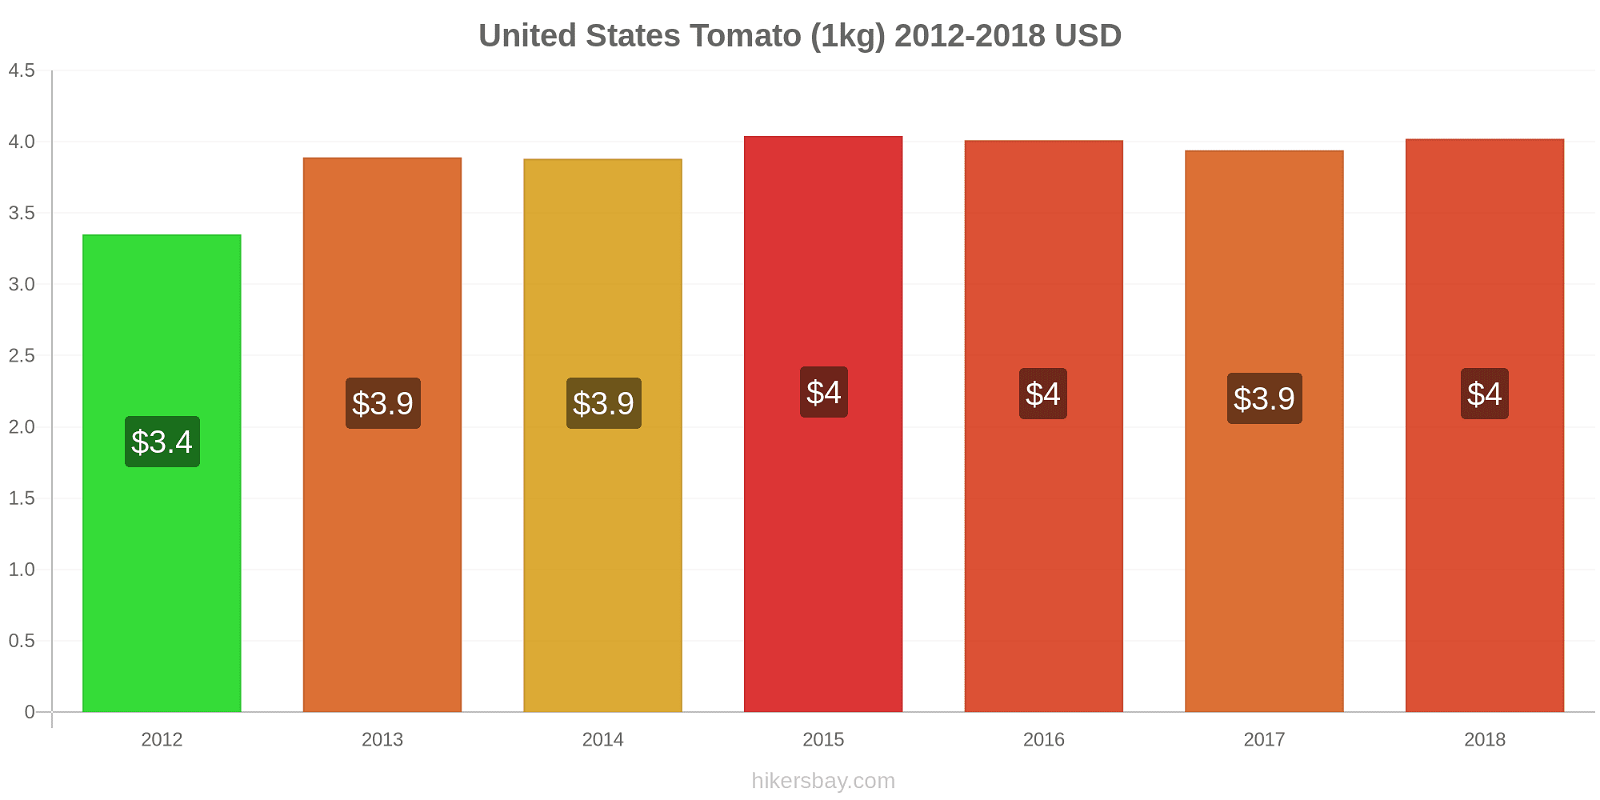 United States price changes Tomato (1kg) hikersbay.com